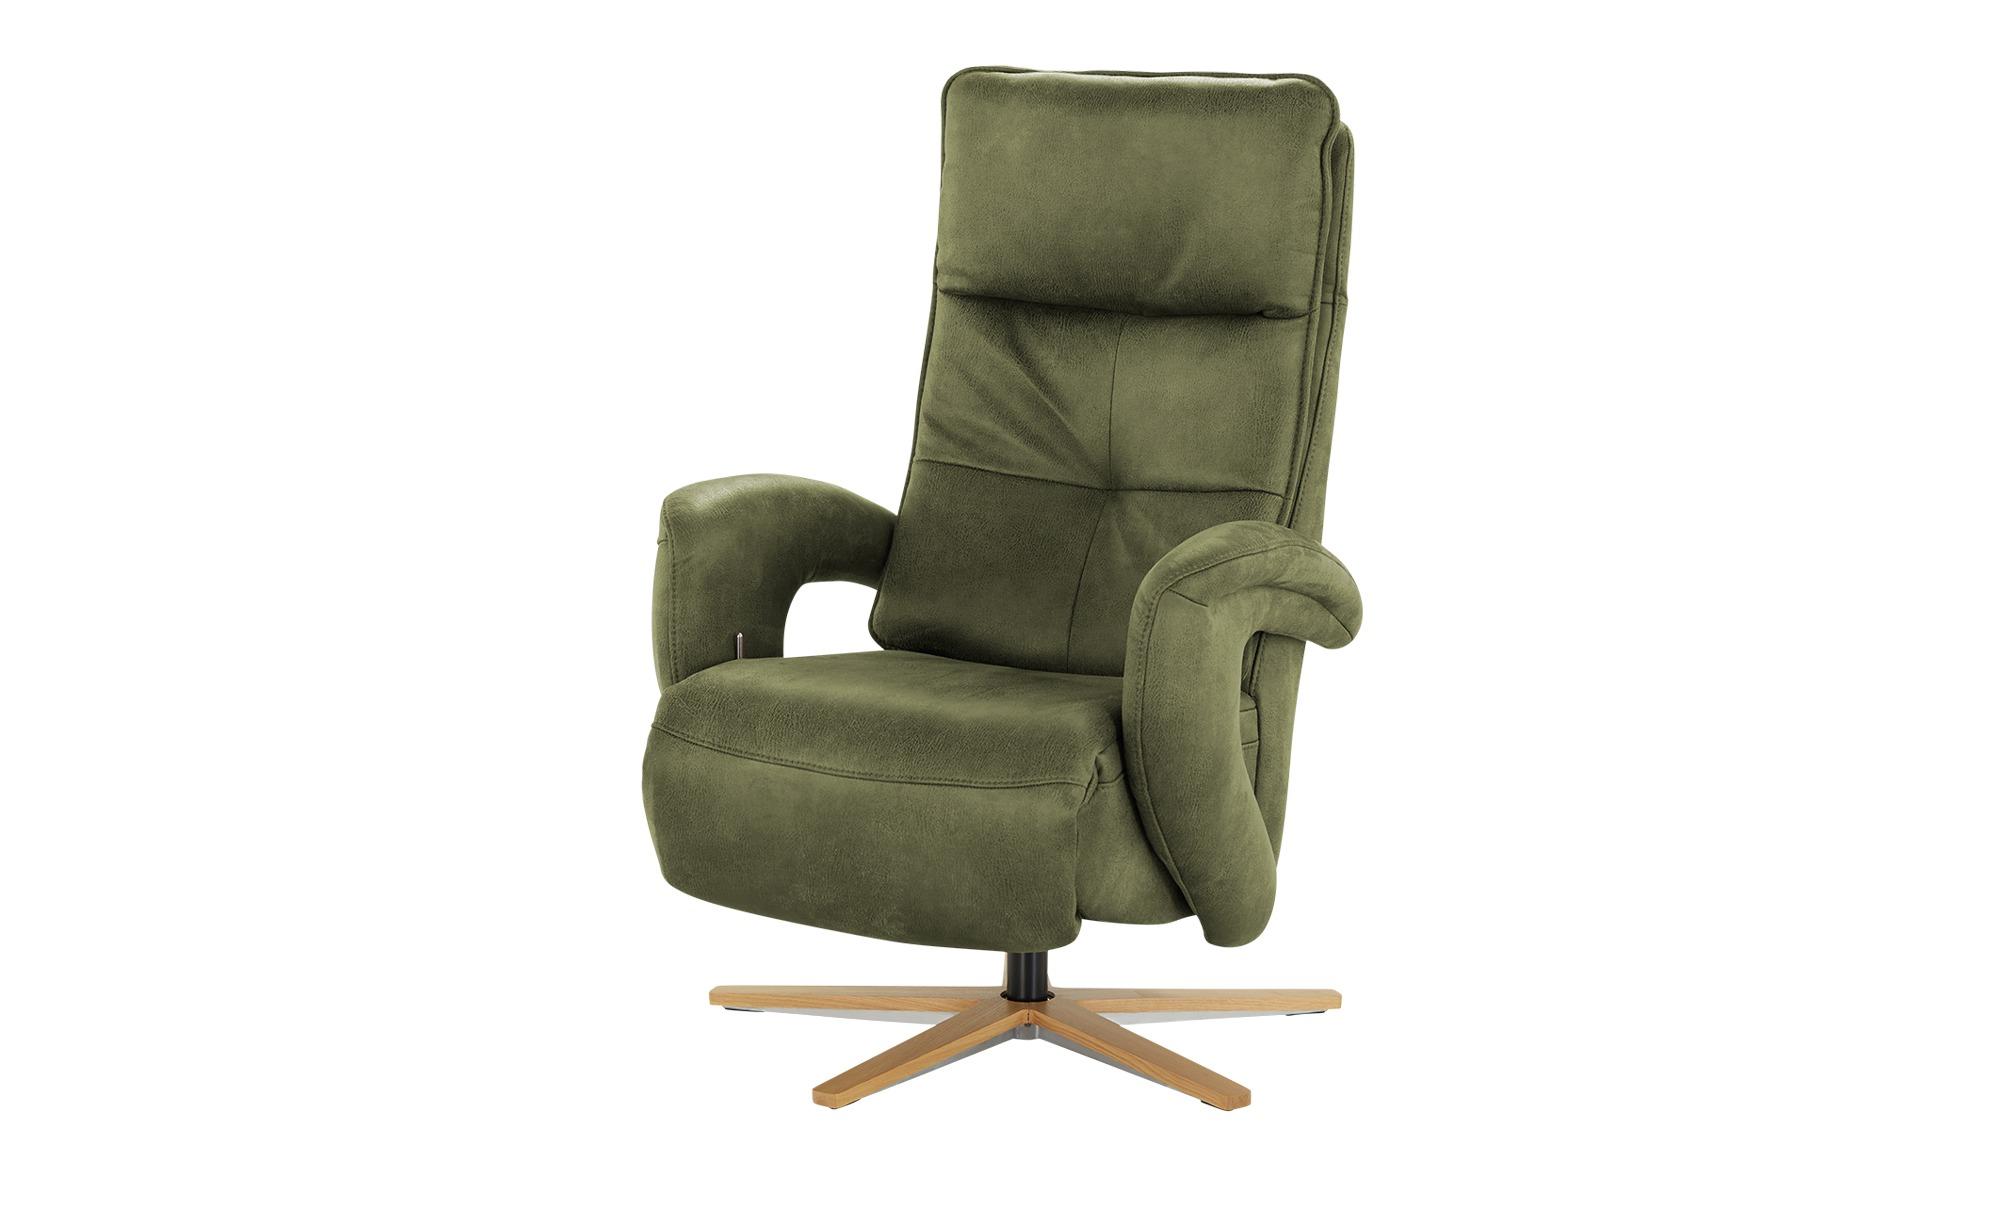 Relaxsessel  Edvin ¦ grün ¦ Maße (cm): B: 75 H: 112 T: 87 Polstermöbel > Sessel > Ledersessel - Höffner